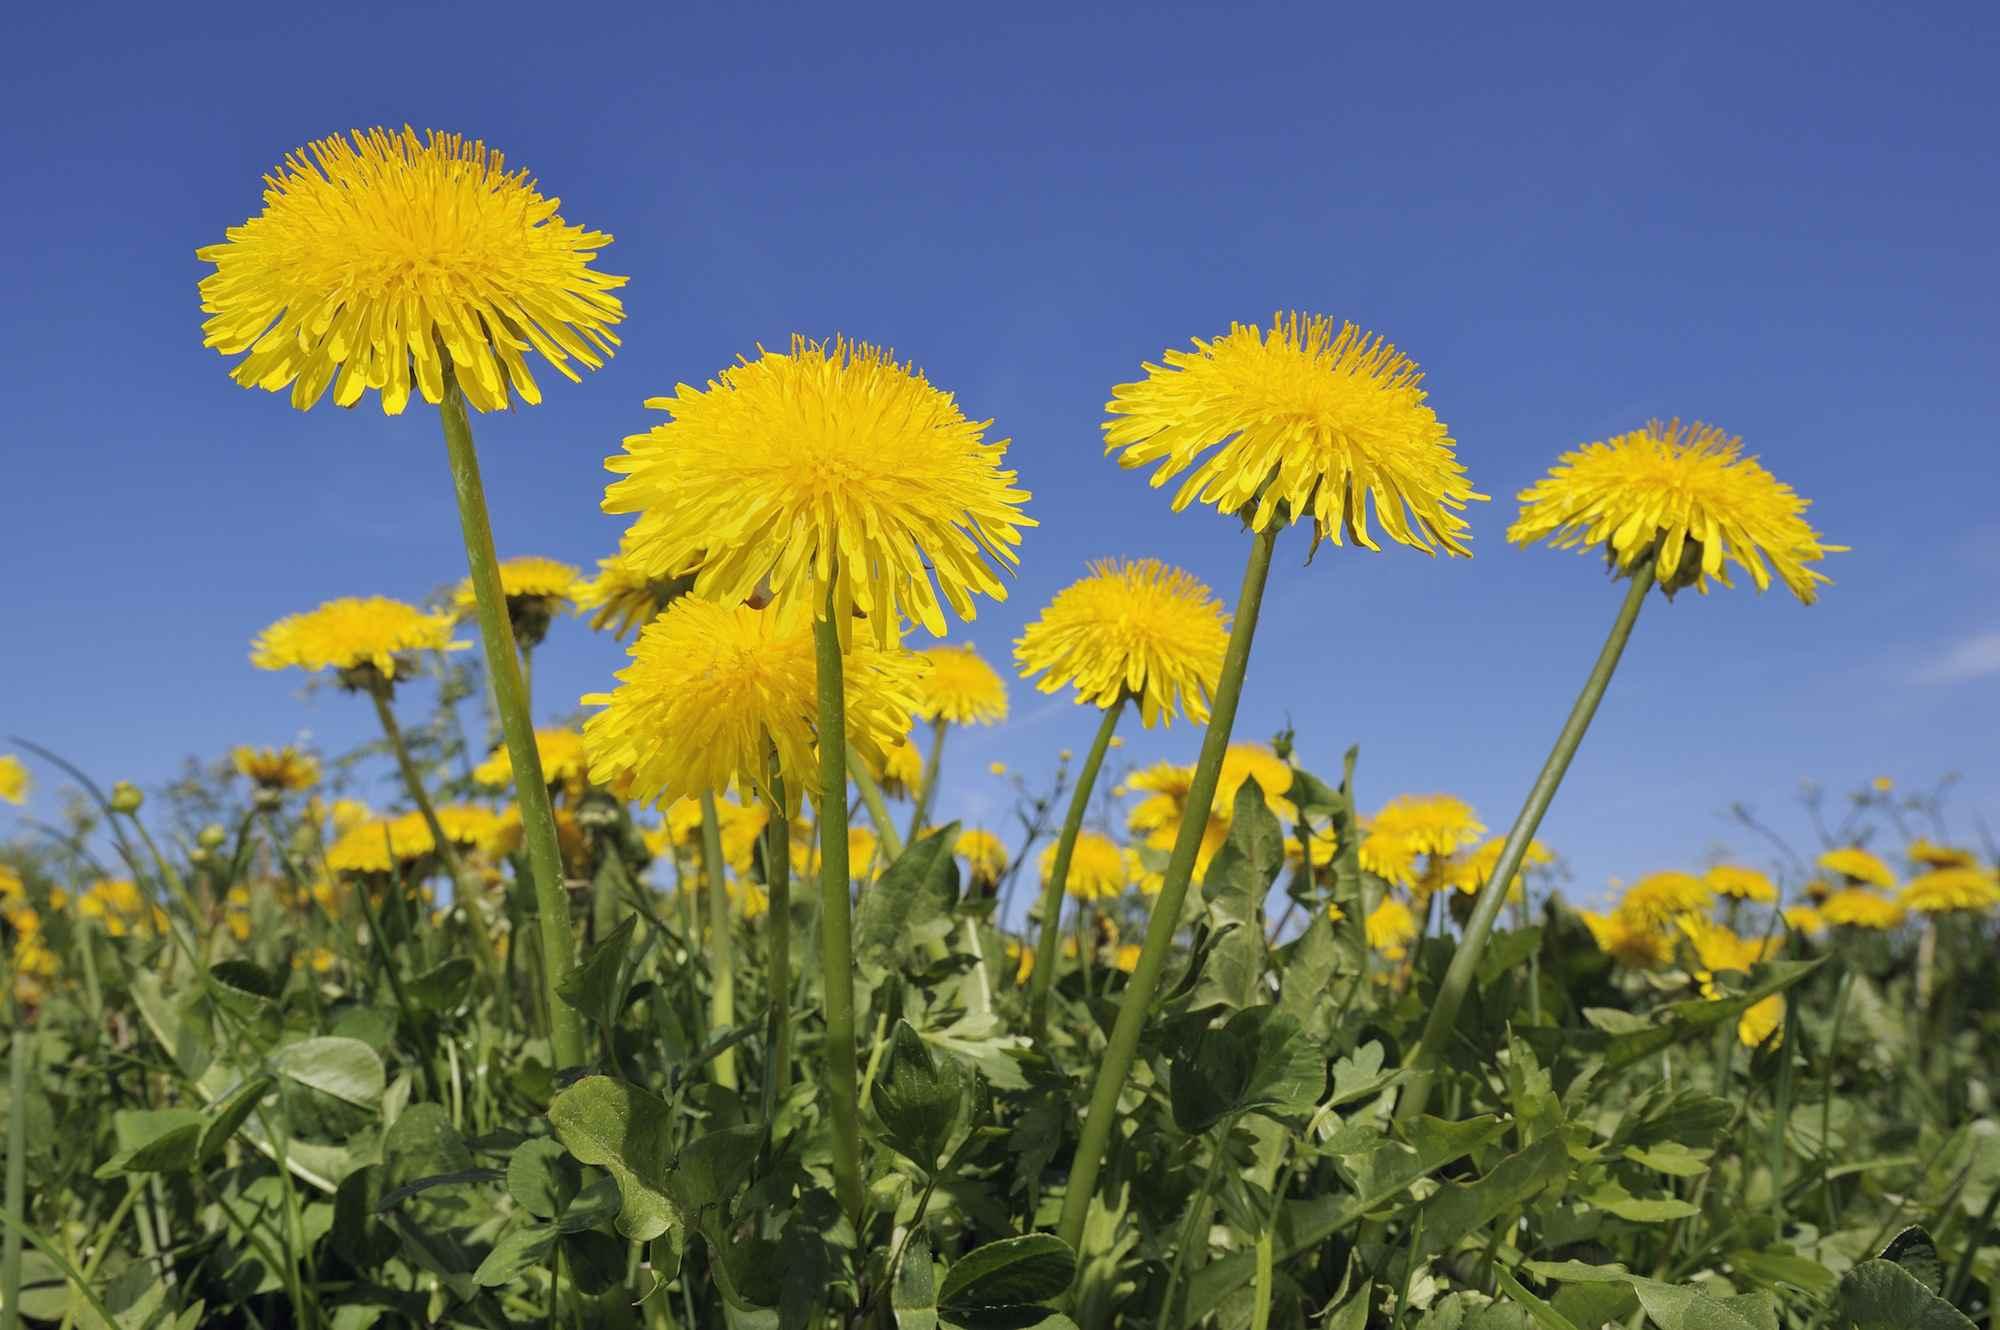 Dandelion (Taraxacum officinale) meadow